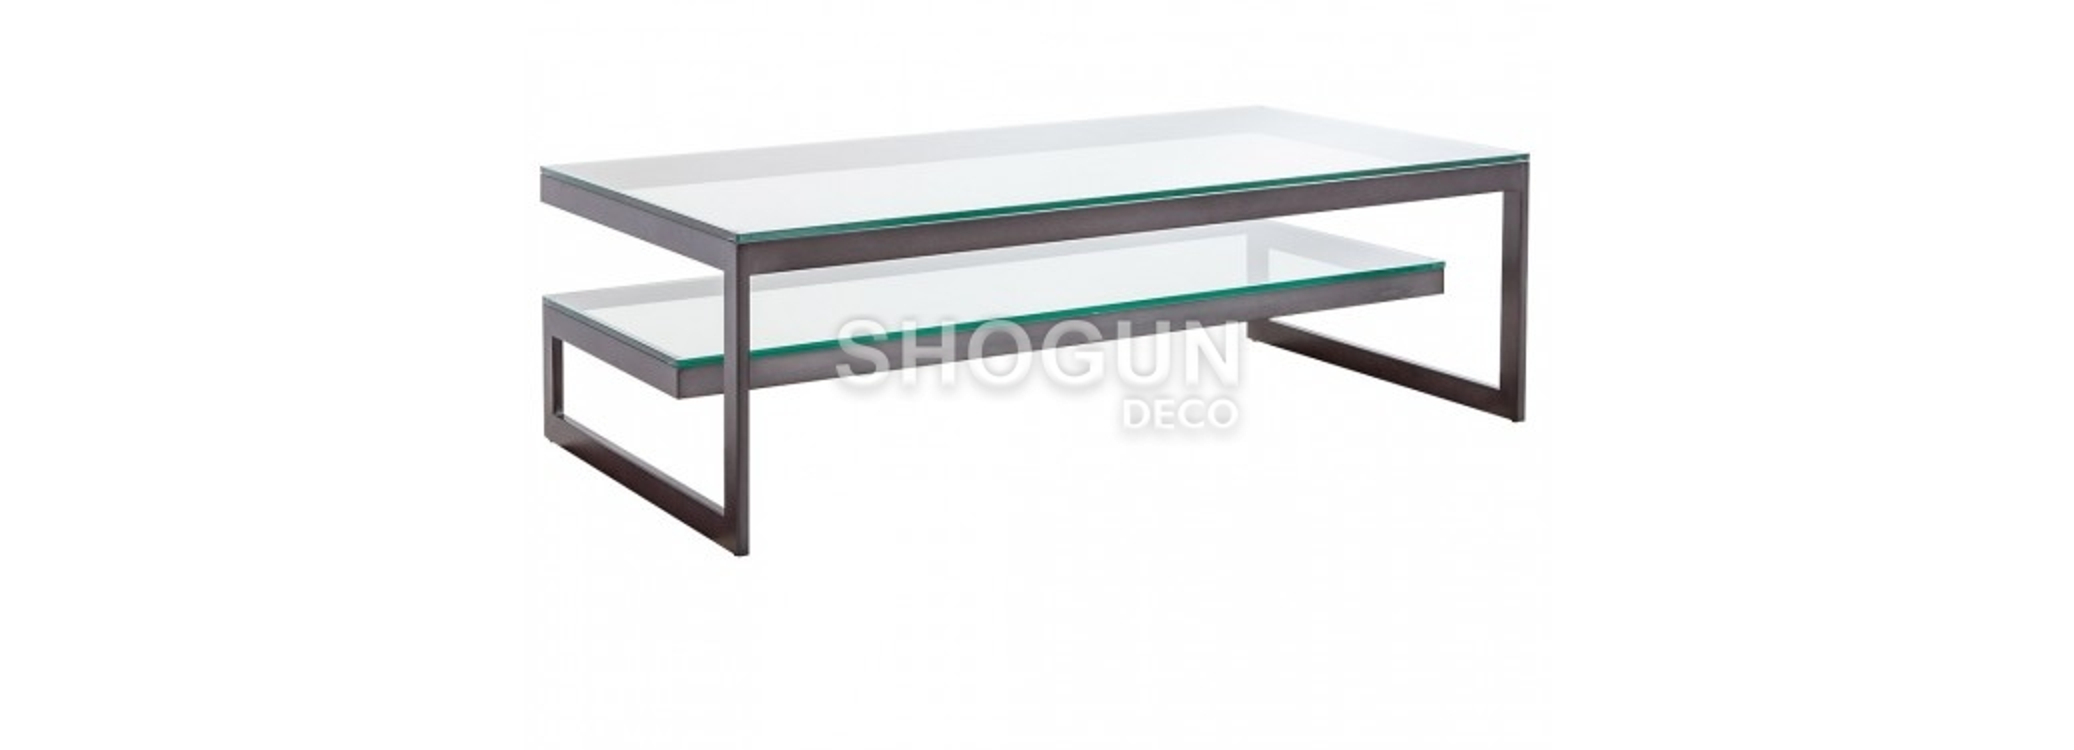 Table basse rectangulaire Azura